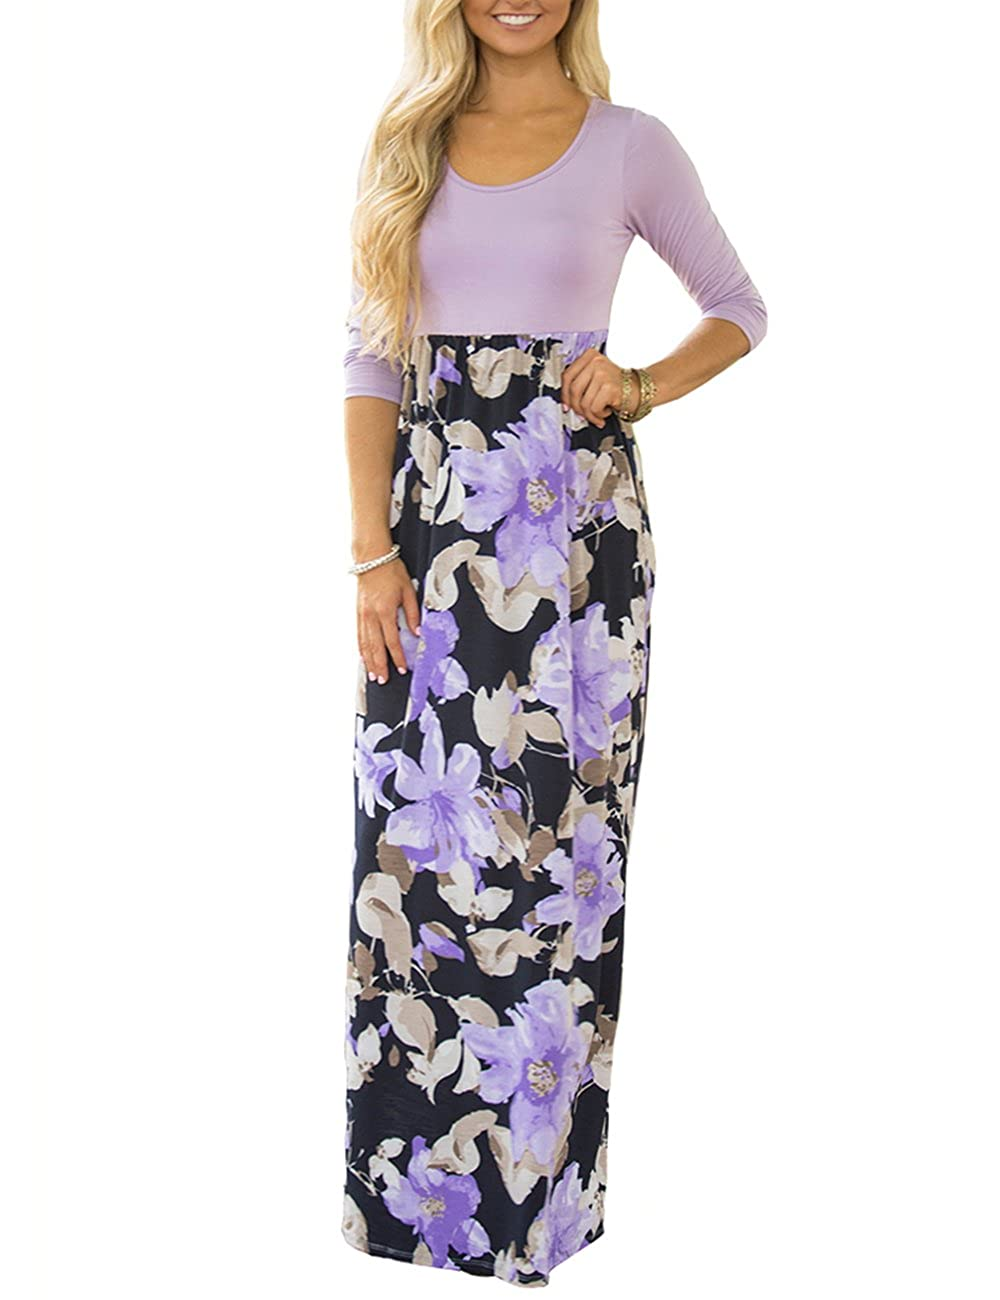 Purple DUNEA Women's Maxi Dress Floral Printed Autumn 3 4 Sleeve Casual Tunic Long Maxi Dress